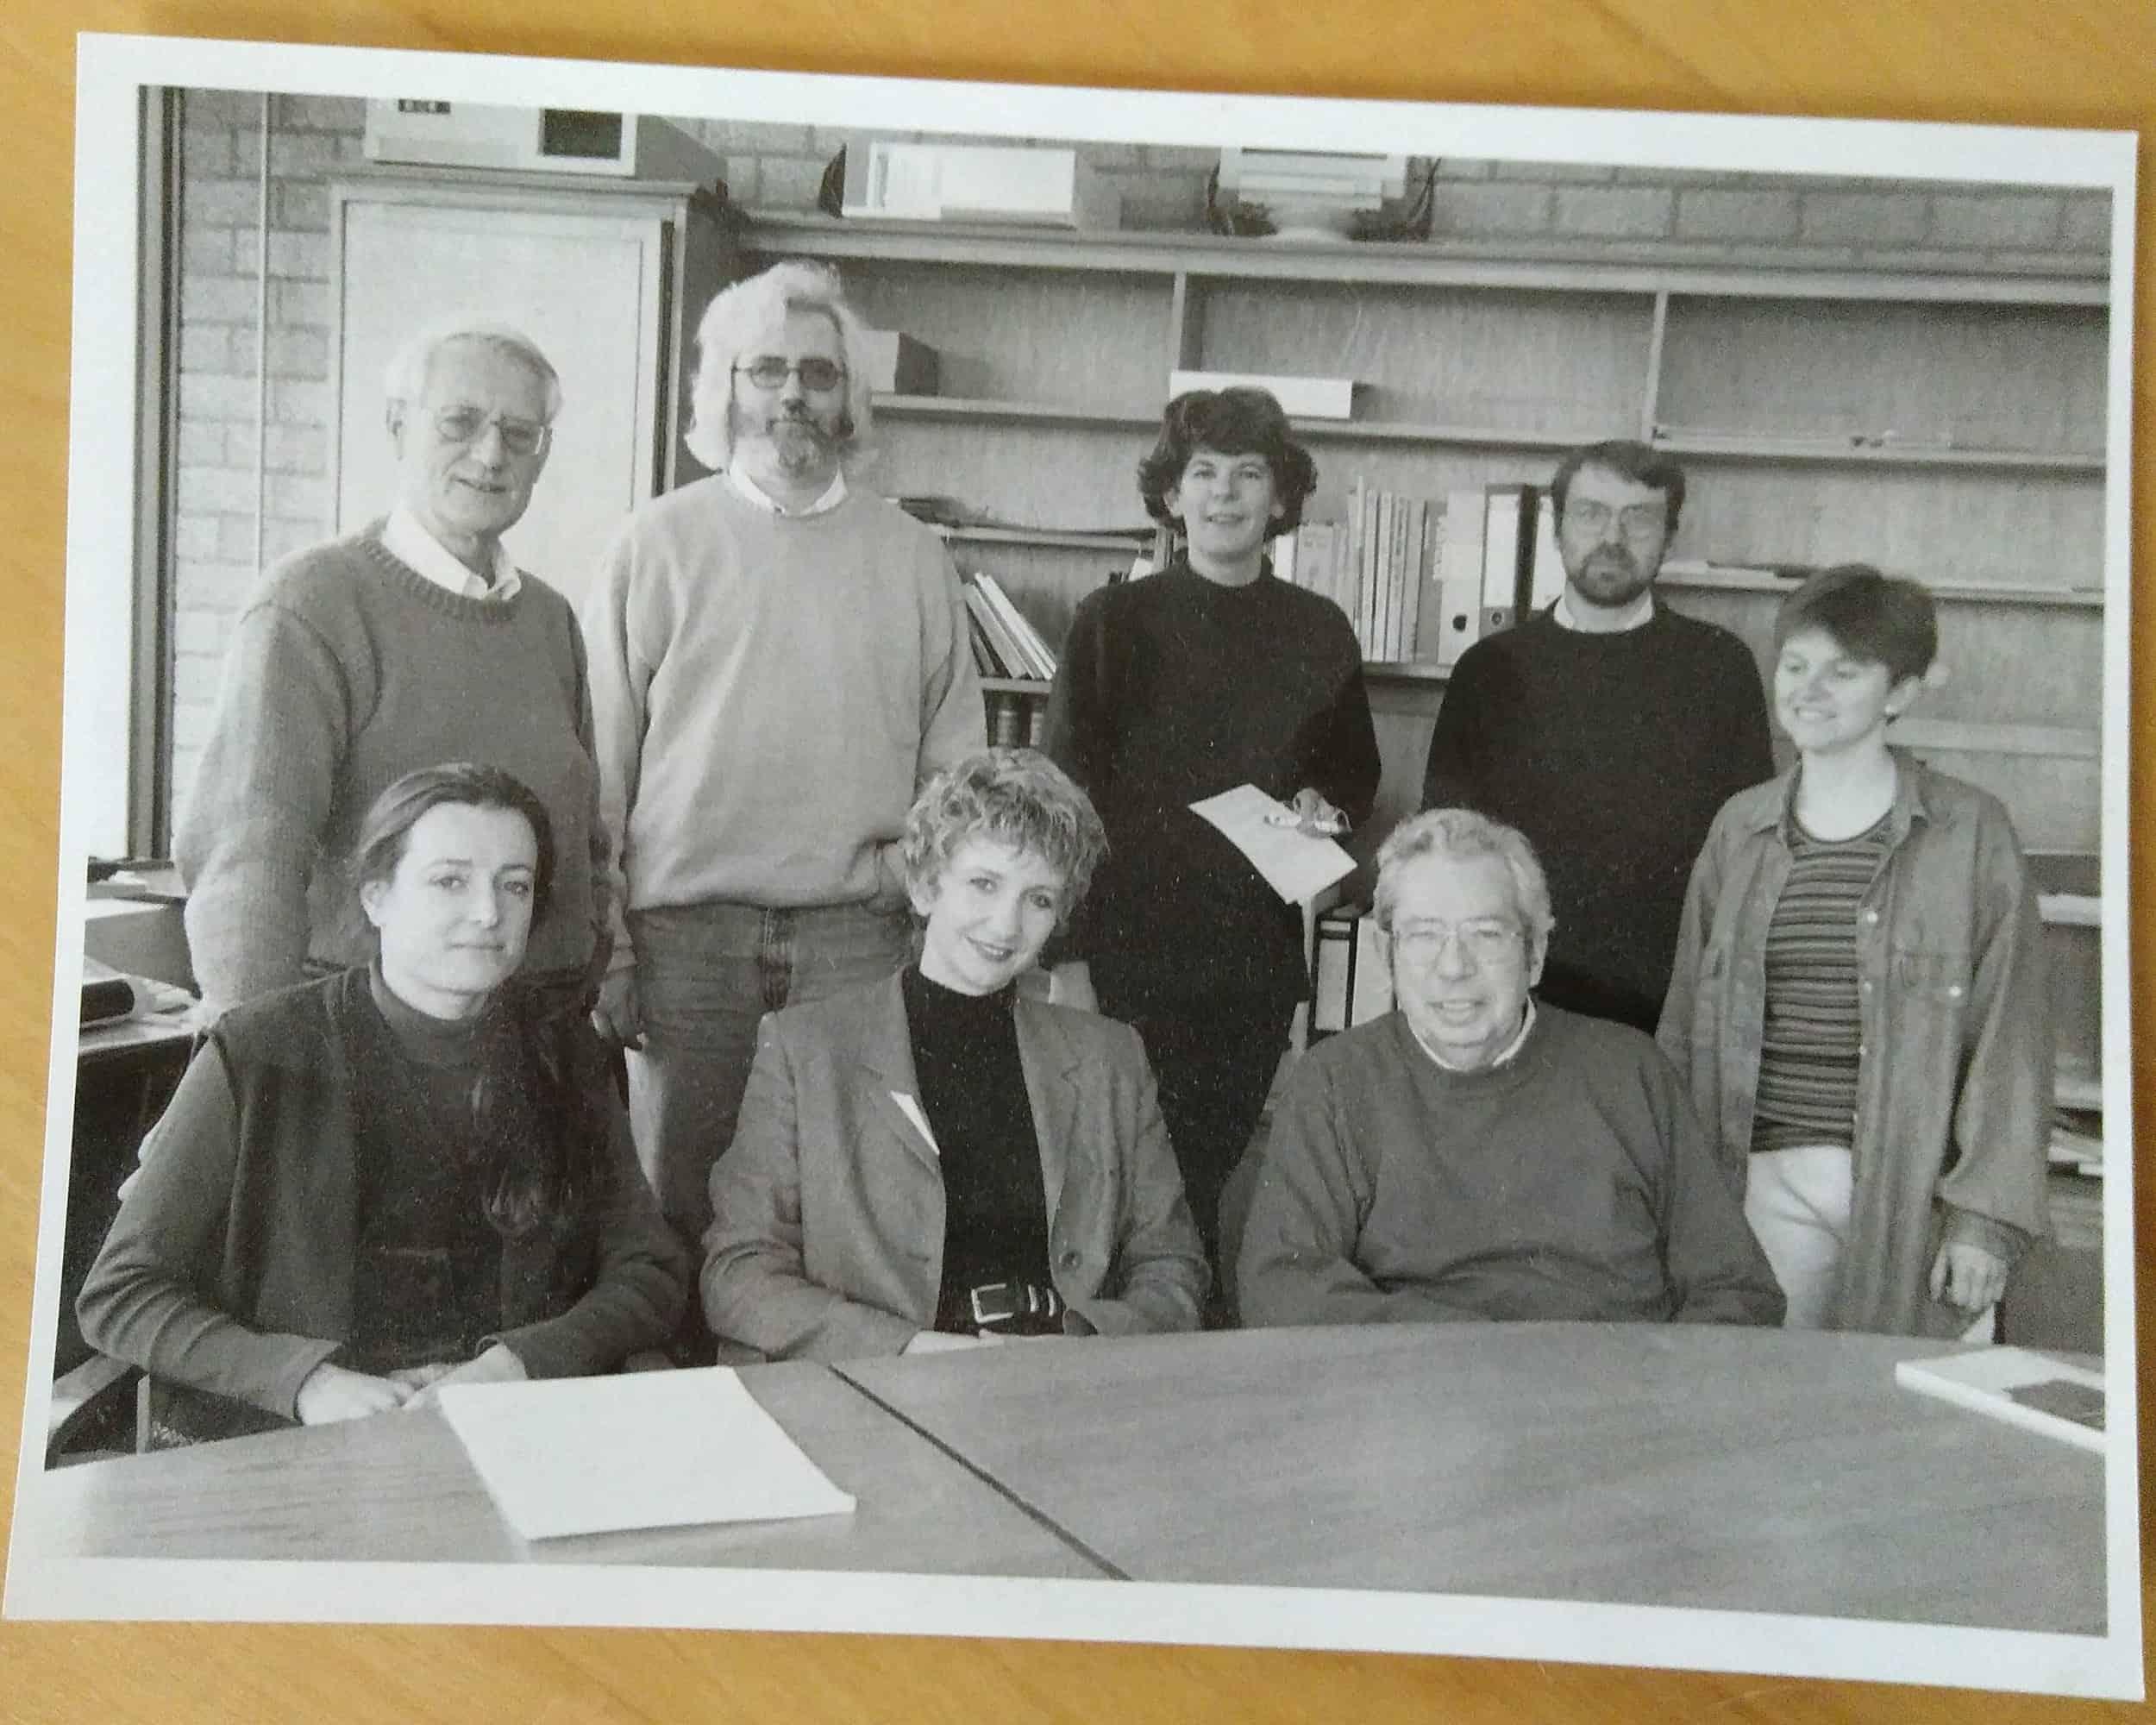 DSTS 1994-1998